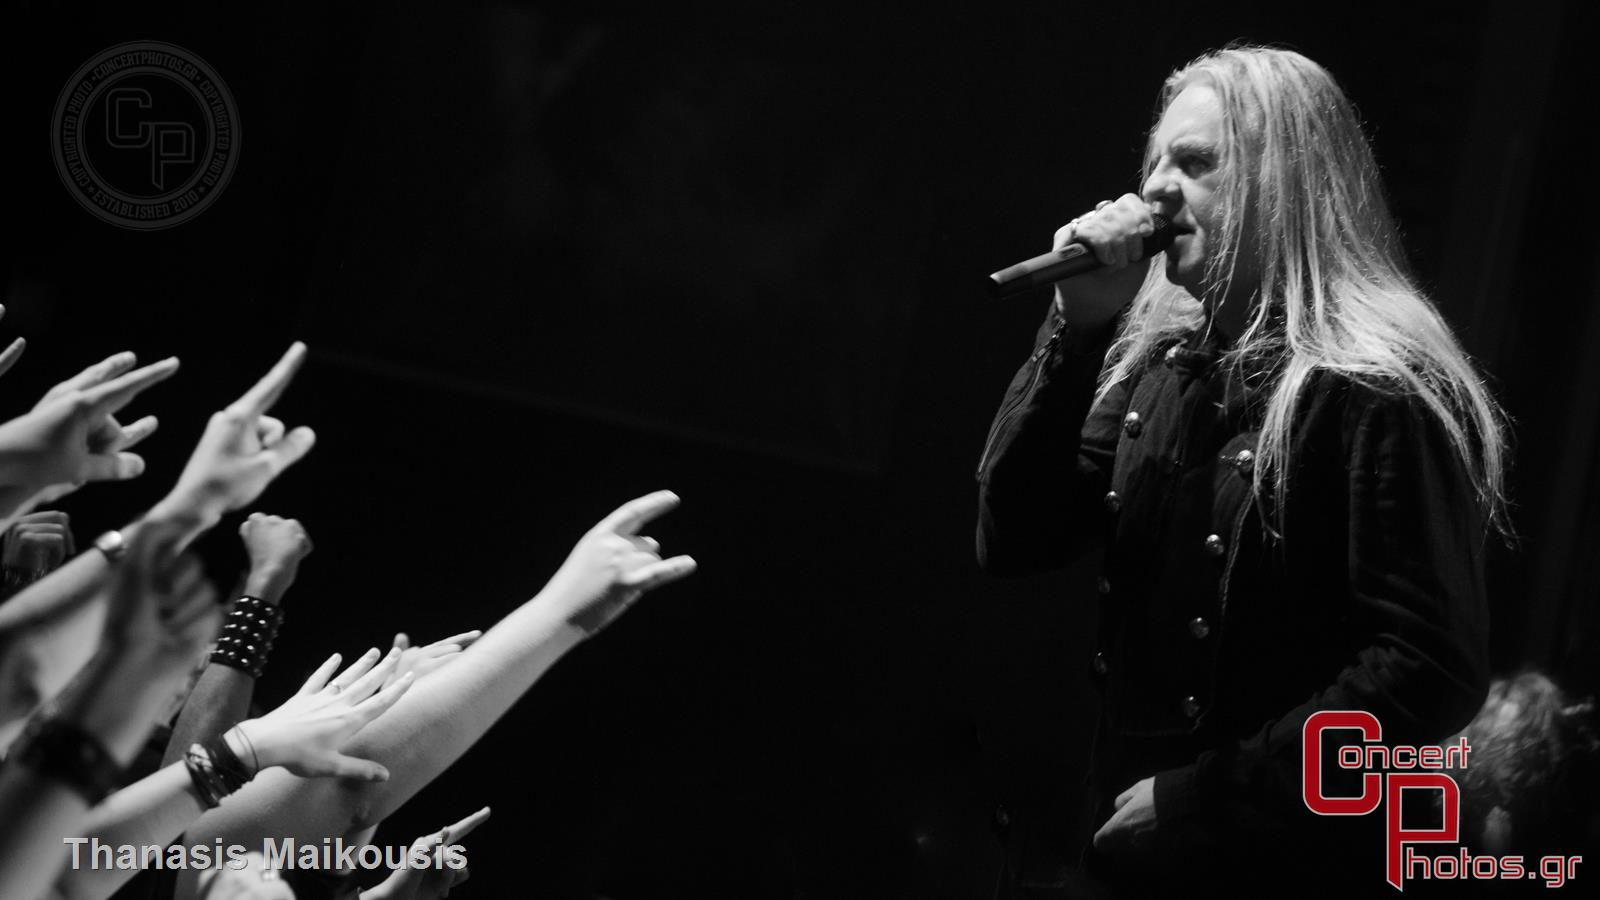 Saxon & Innerwish -Saxon Innerwish Gagarin photographer: Thanasis Maikousis - concertphotos_20141025_23_04_56